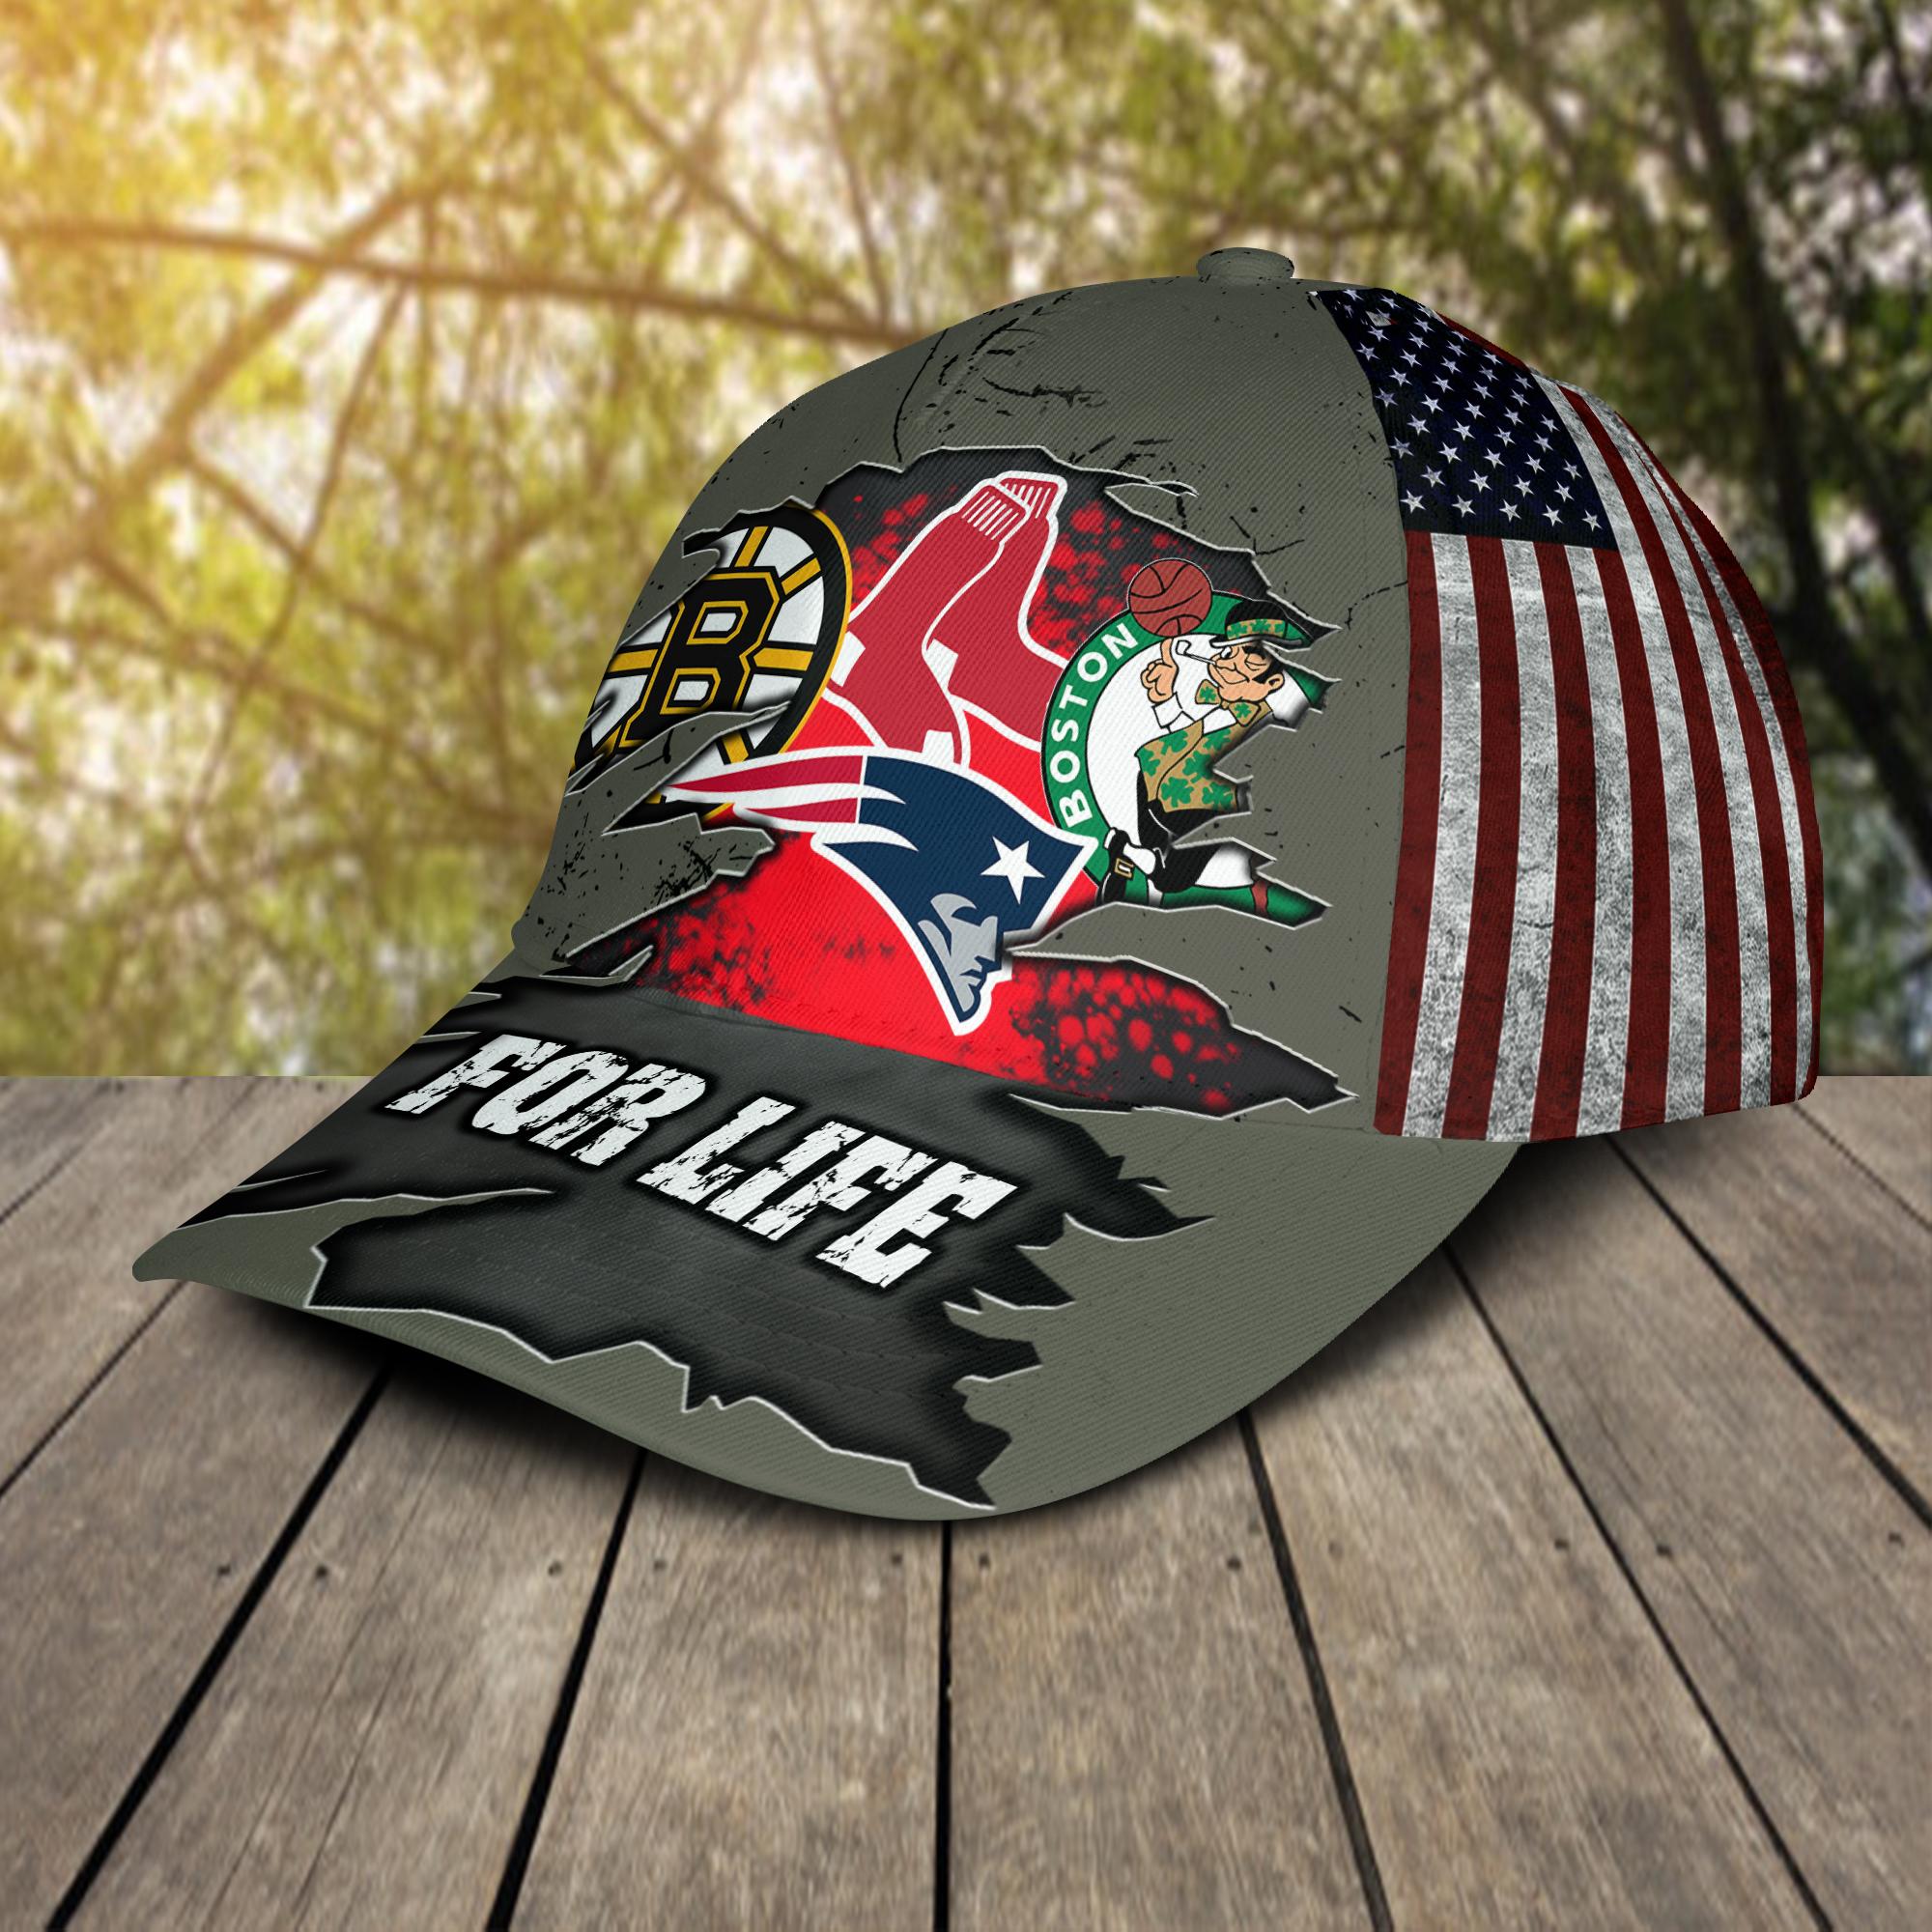 Boston-Celtics-New-England-Patriots-Boston-Bruins-Boston-Red-Sox-For-Life-Cap-Hat-2